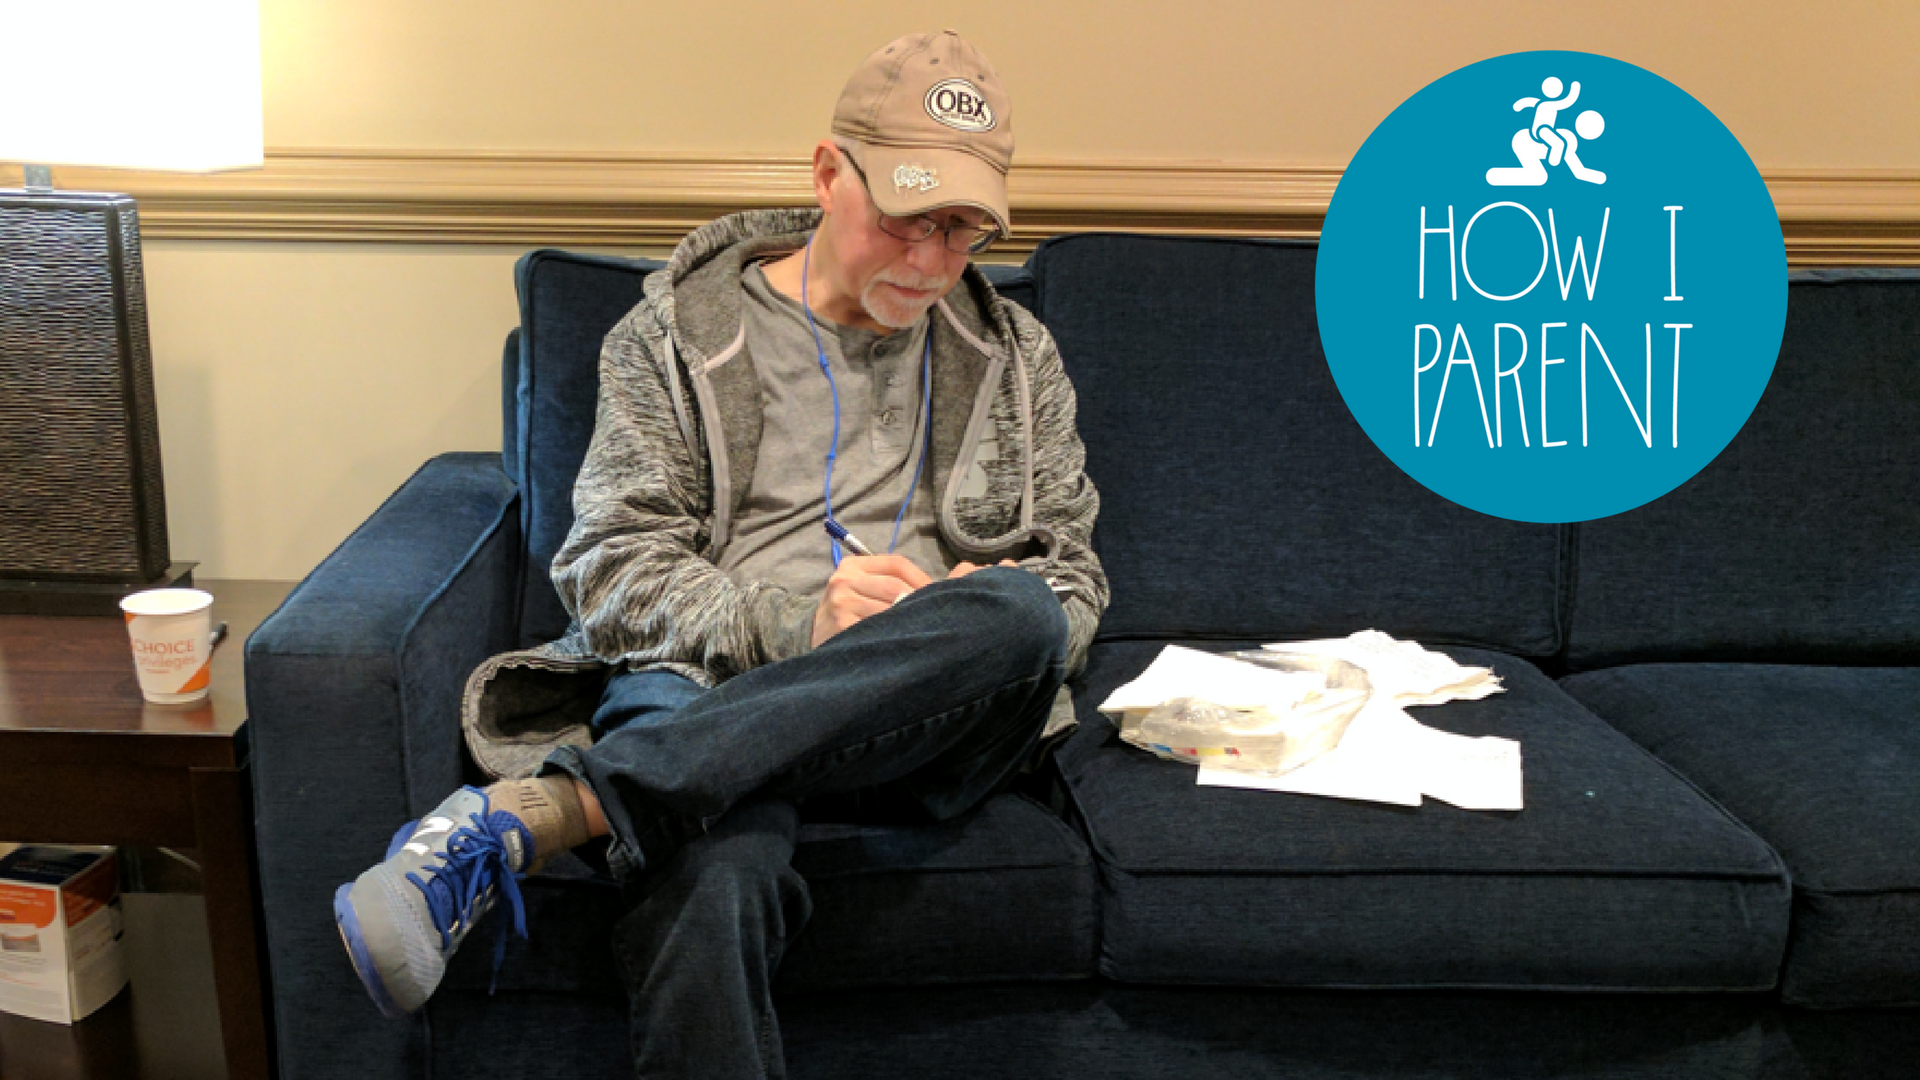 On Lifehacker: How I Parent